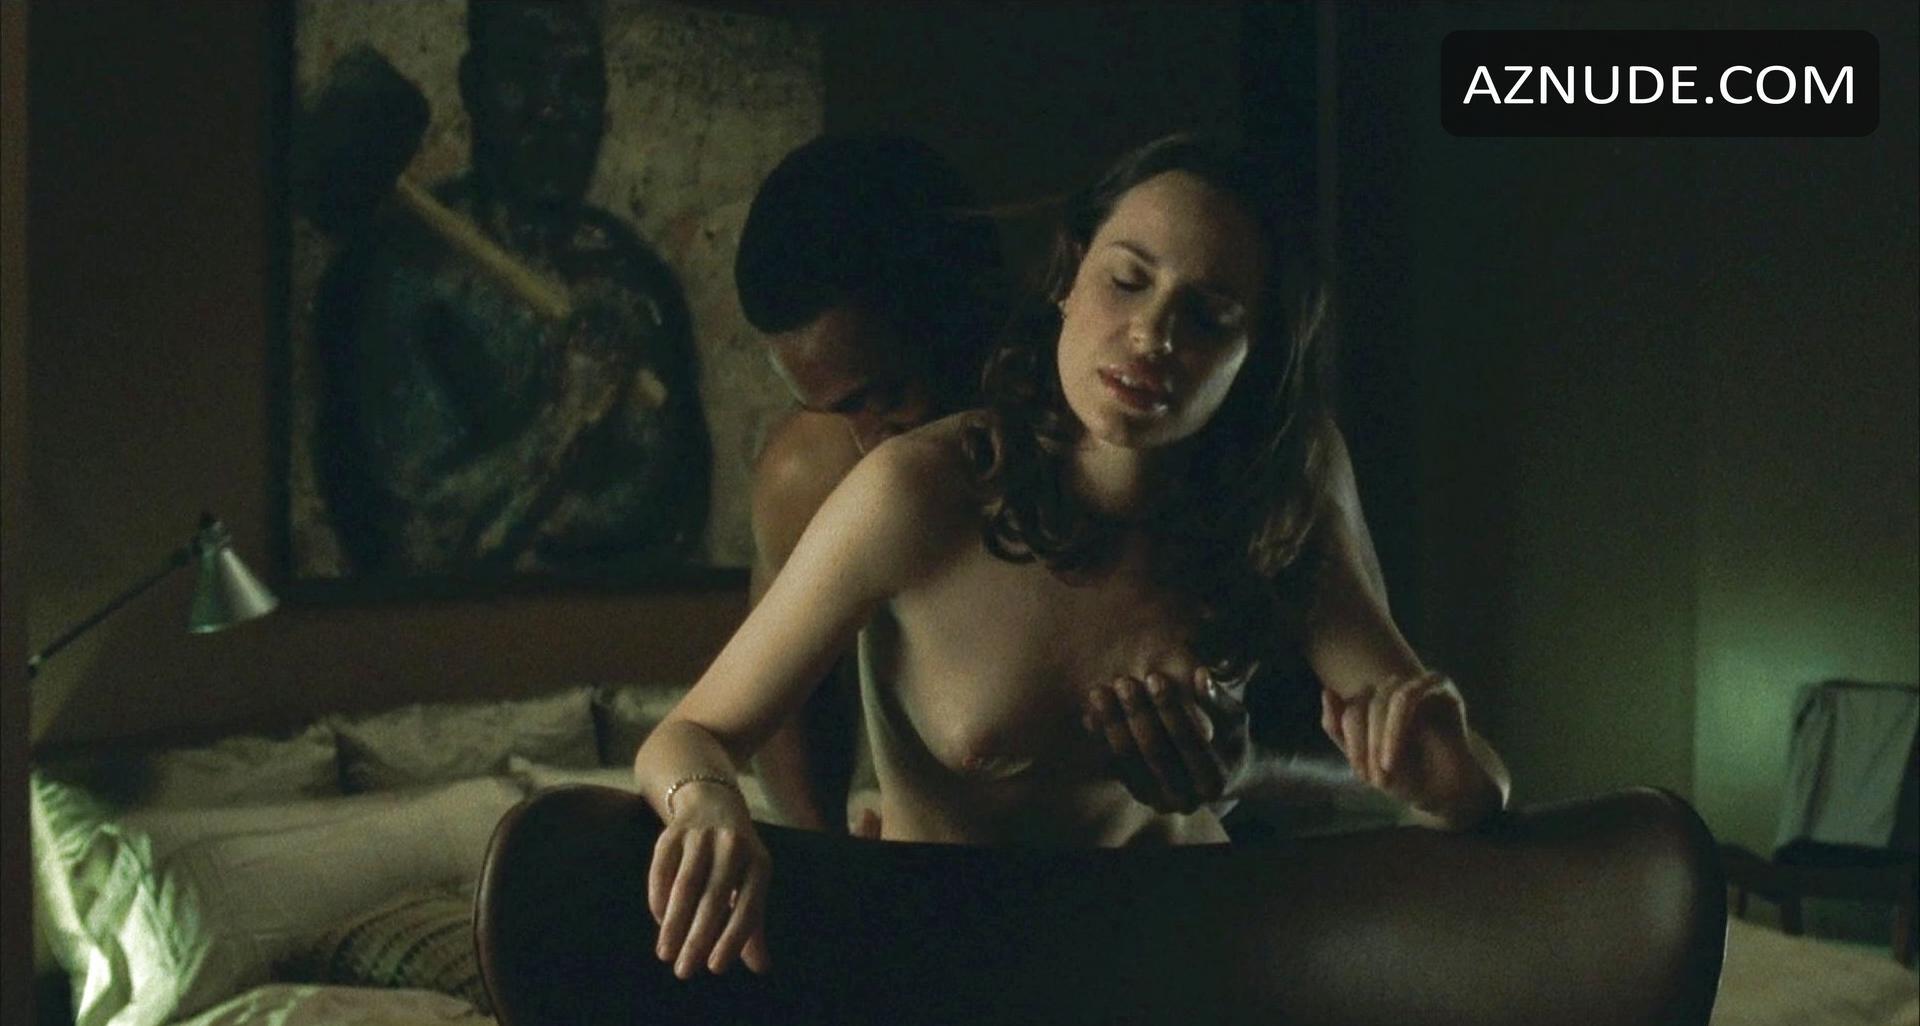 Kerry washington topless sex scene mampc - 3 part 4